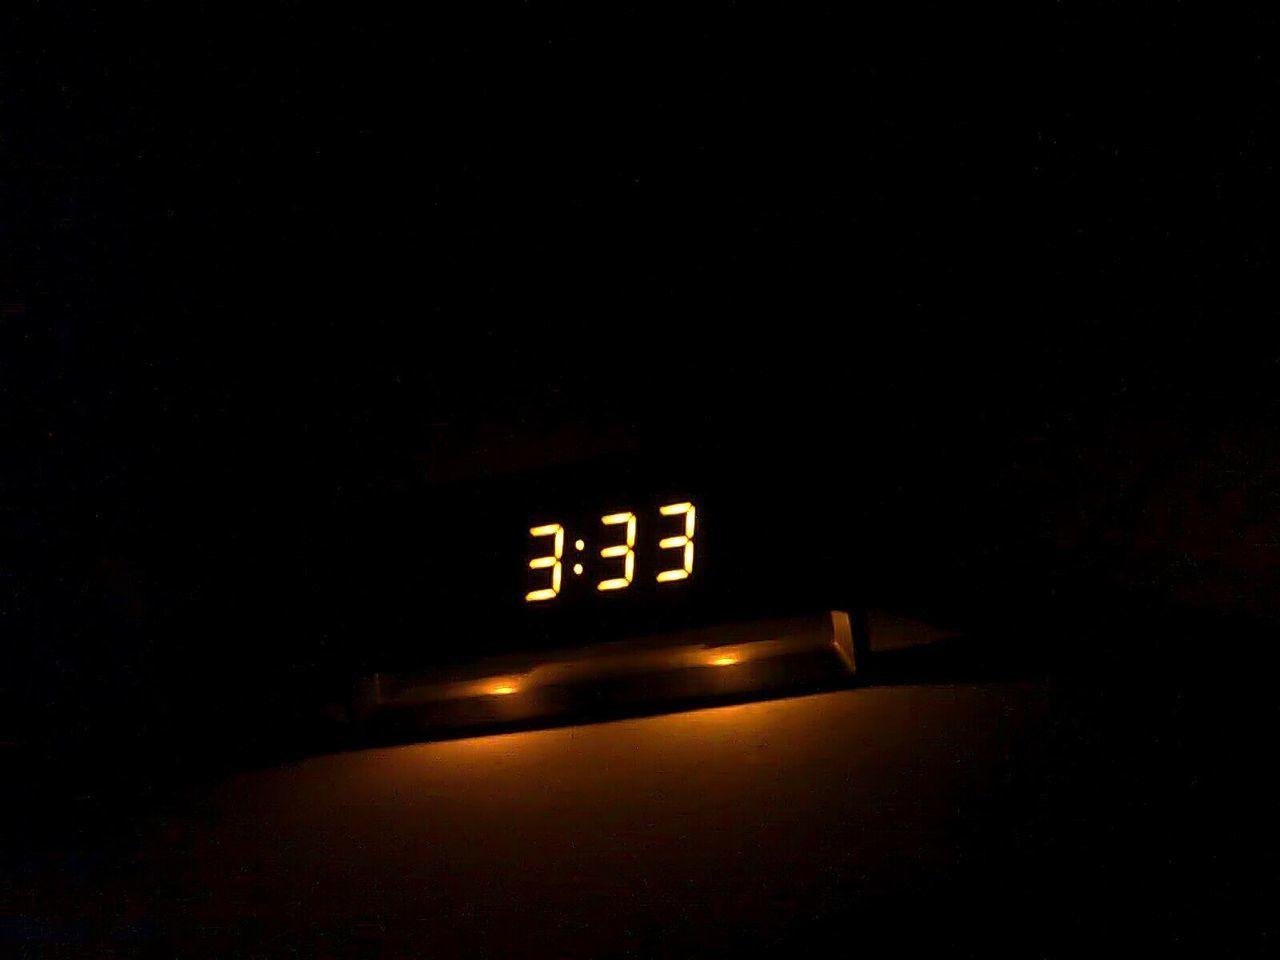 Beautiful stock photos of future, Black, Dark, Electric Clock, Illuminated